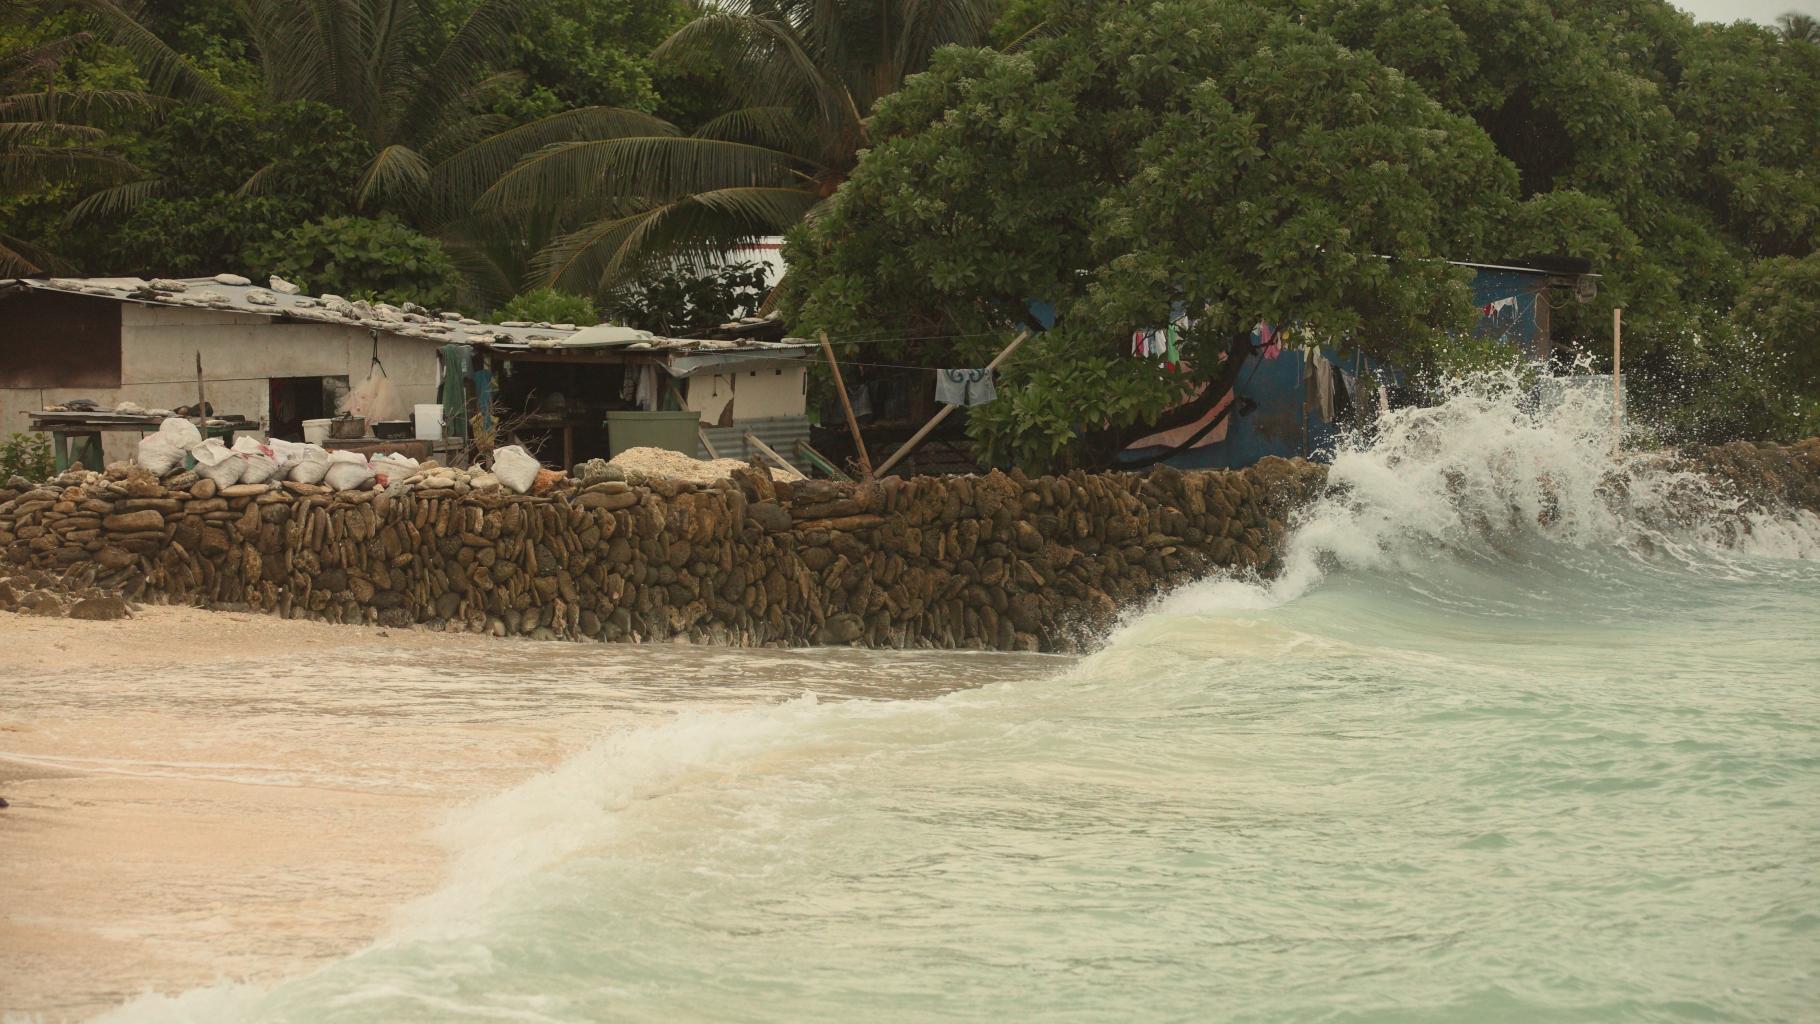 Tarawa, Kiribati